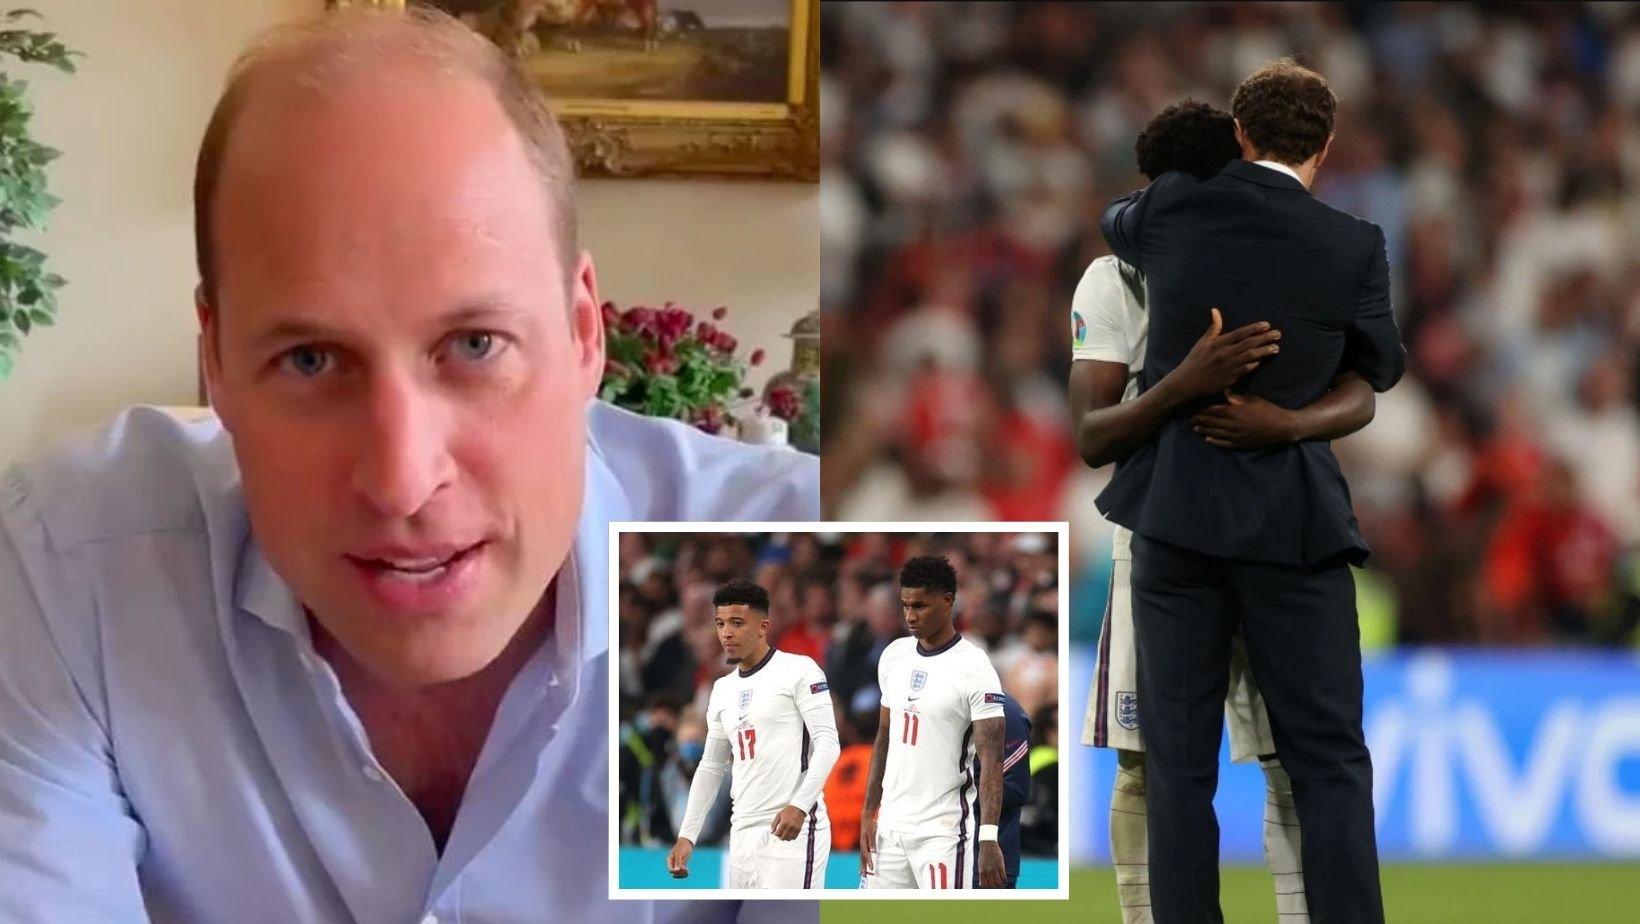 cover 14.jpg?resize=1200,630 - Prince William Slammed Vile Trolls Who Targeted Black England Footballers After Euros Final